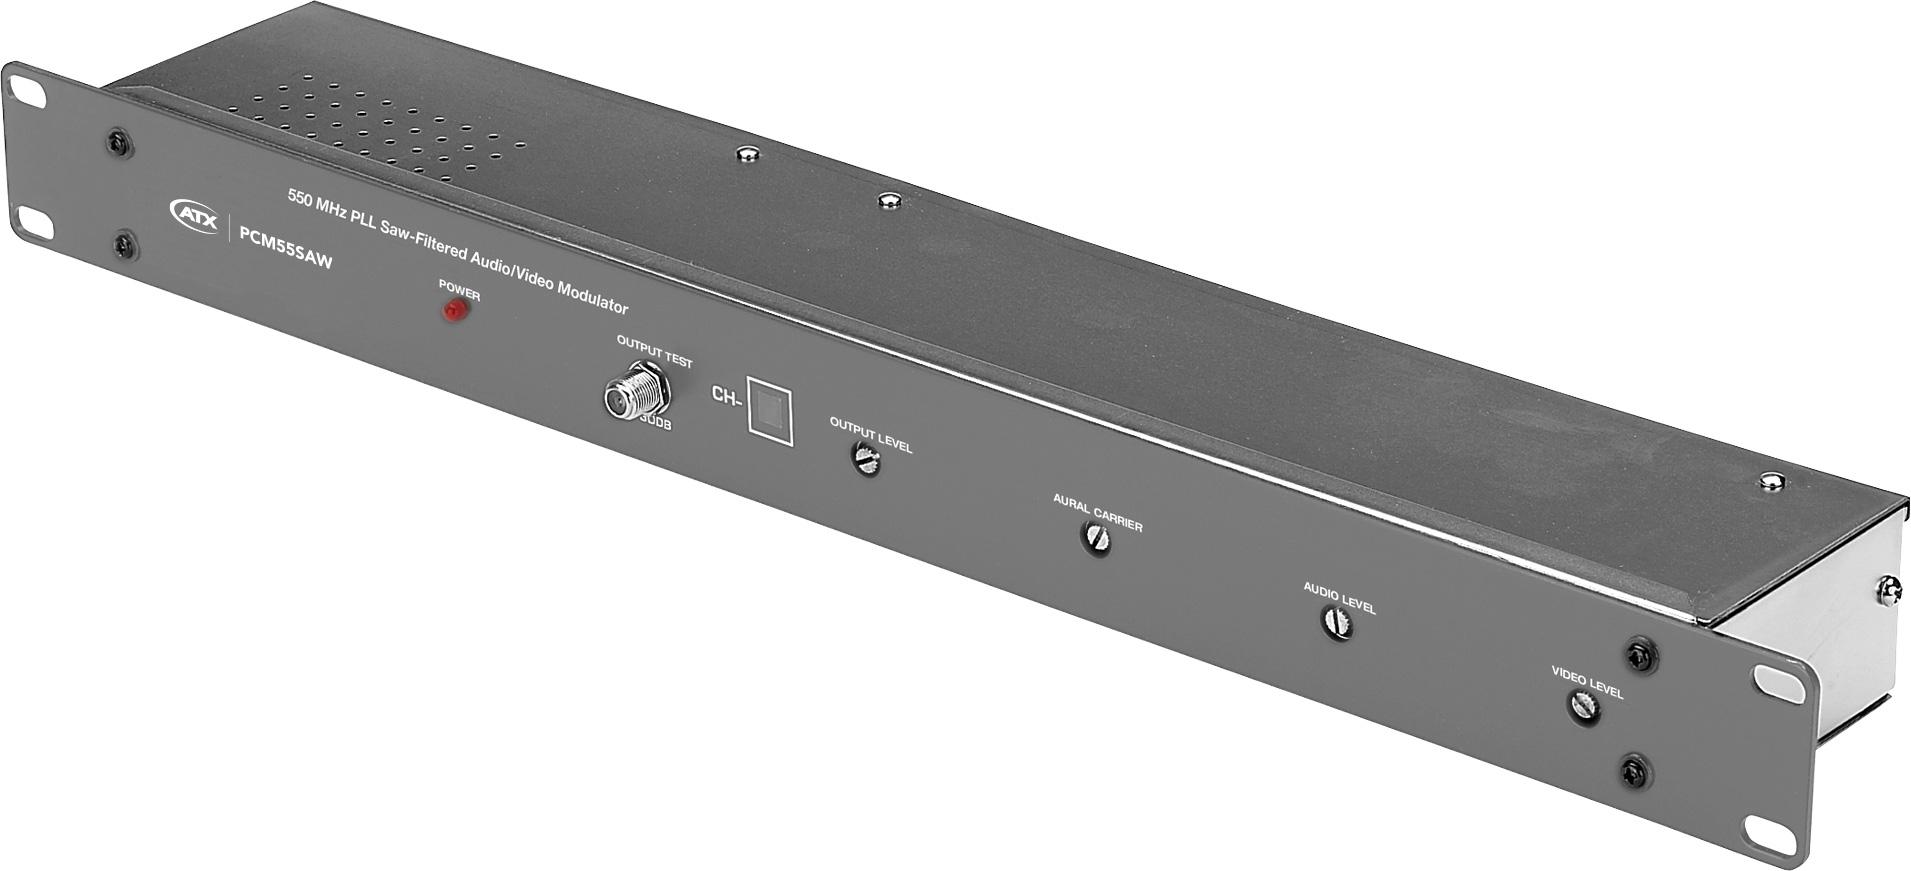 1 Channel Crystal A/V Modulator - Channel BB/38 (306-312) PM-PCM55SAW-38